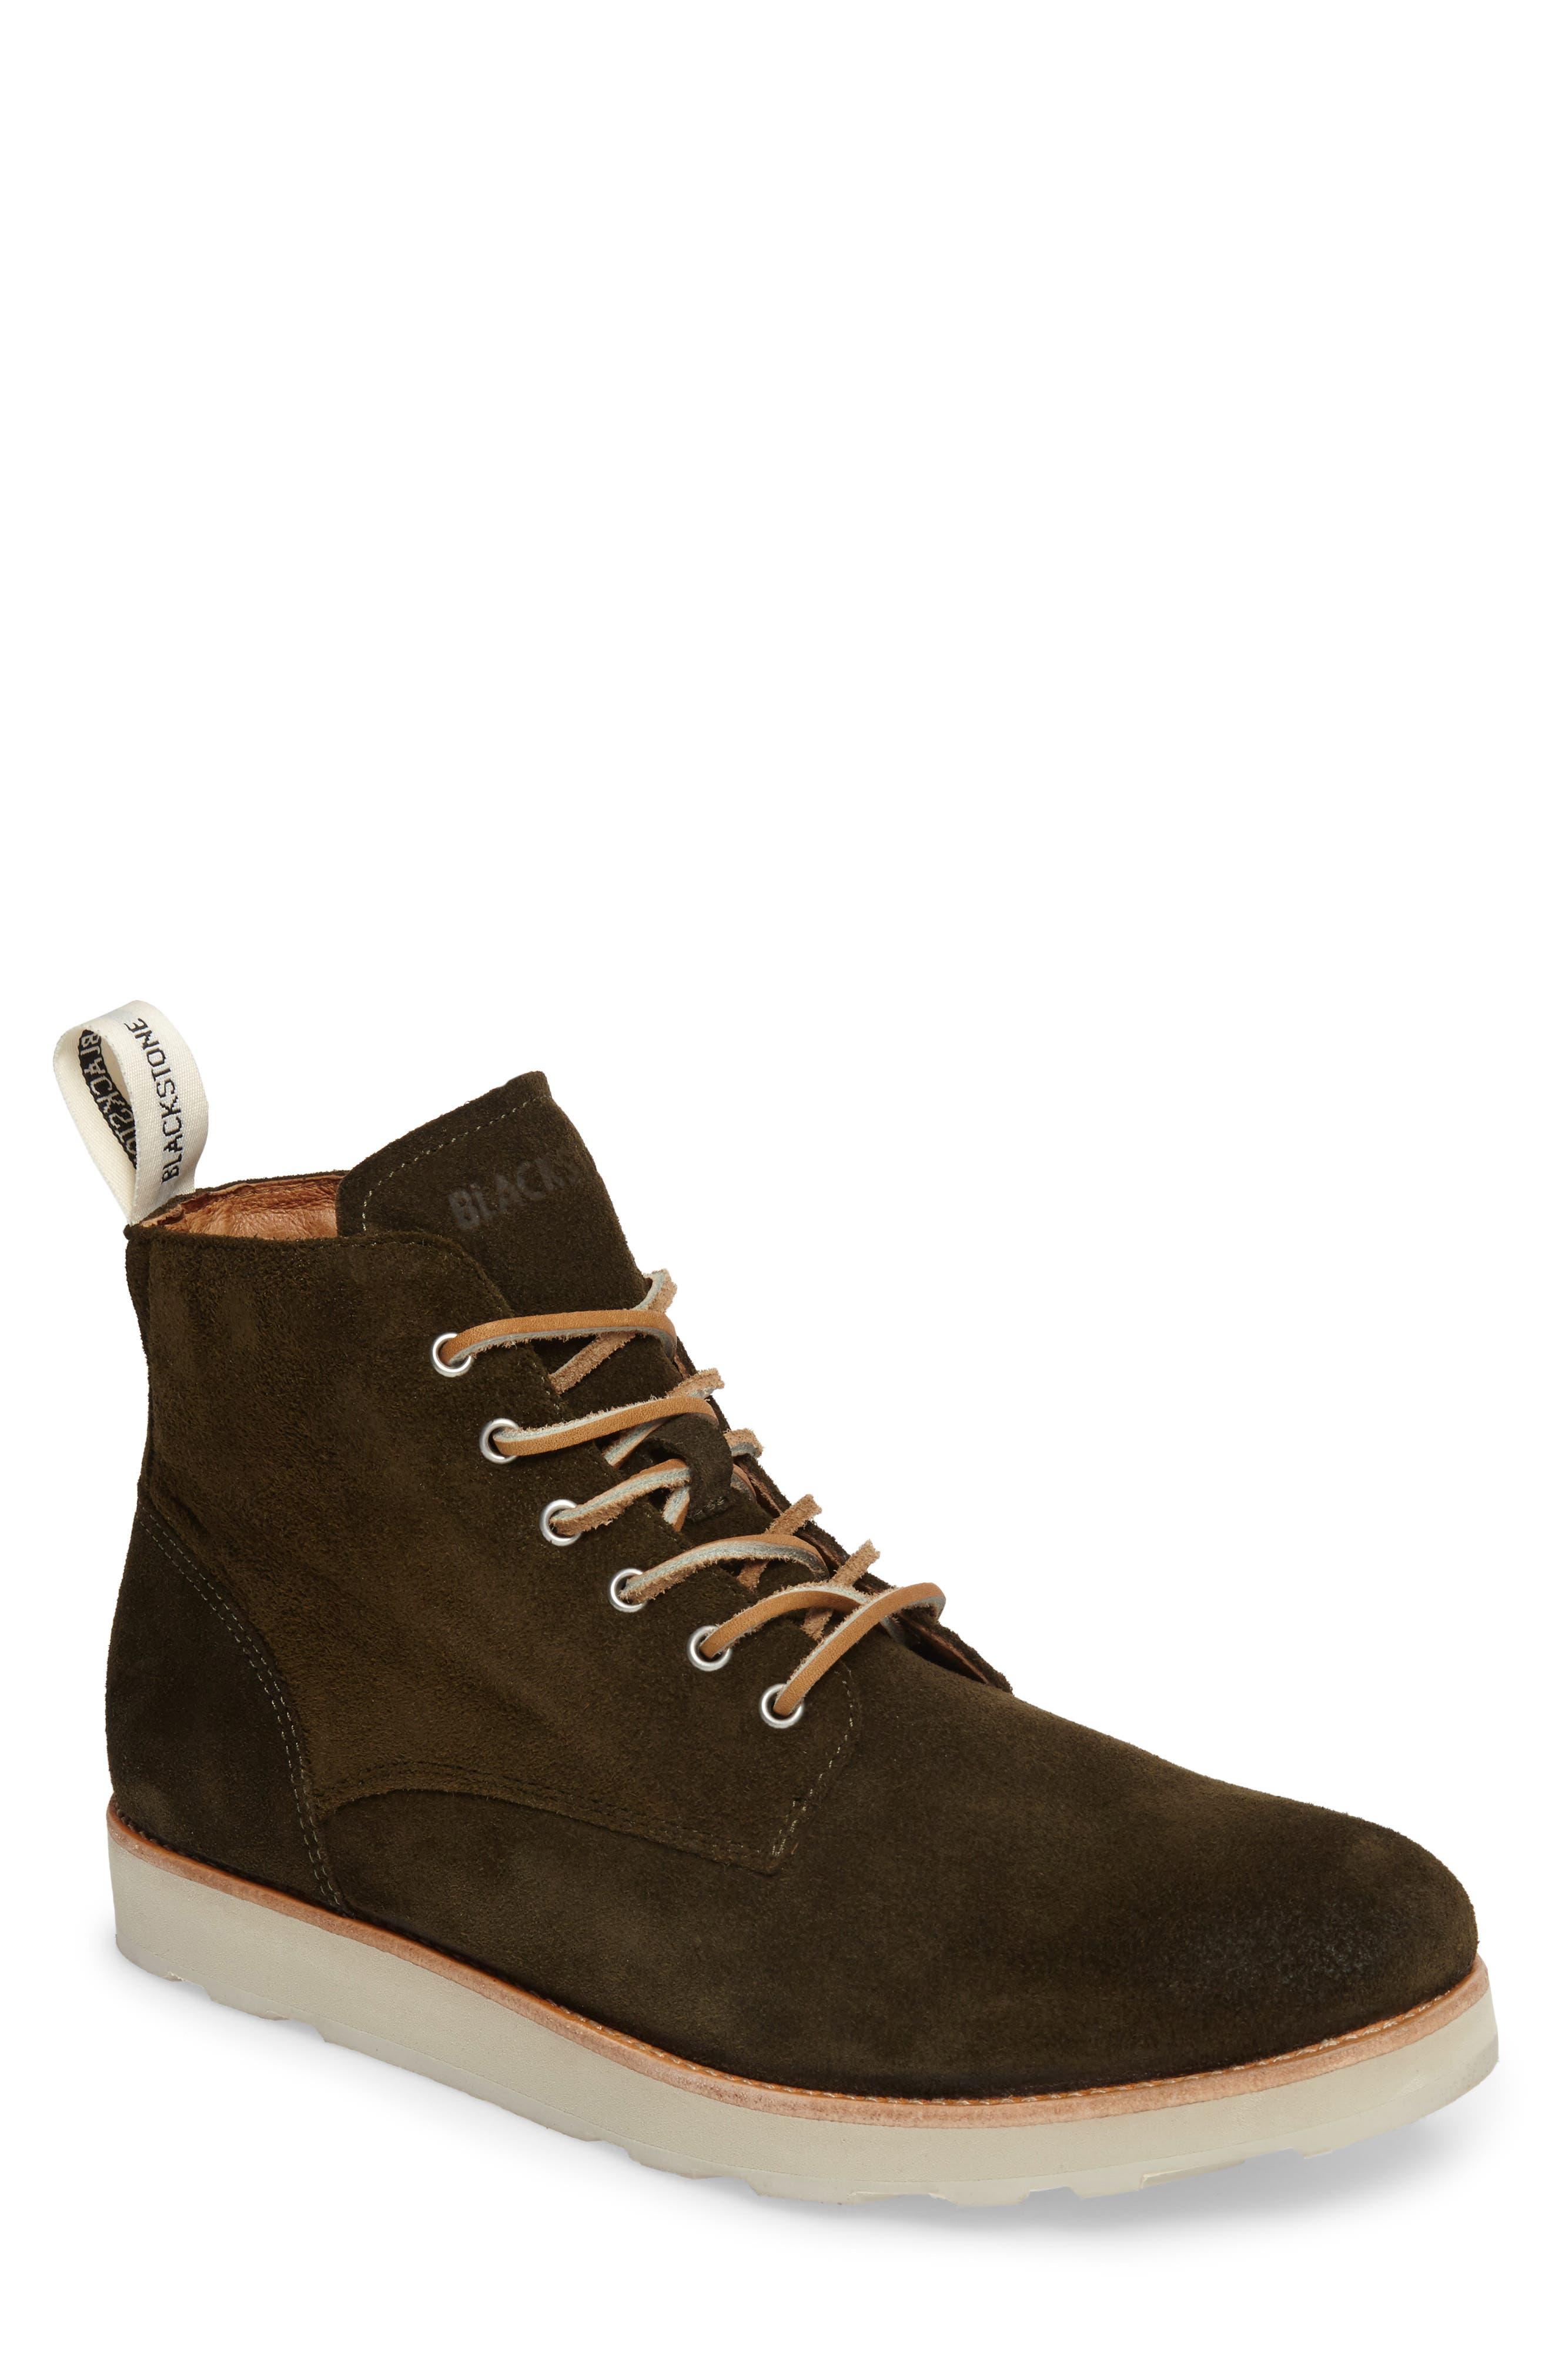 OM 53 Plain Toe Boot,                         Main,                         color, Dark Green Leather